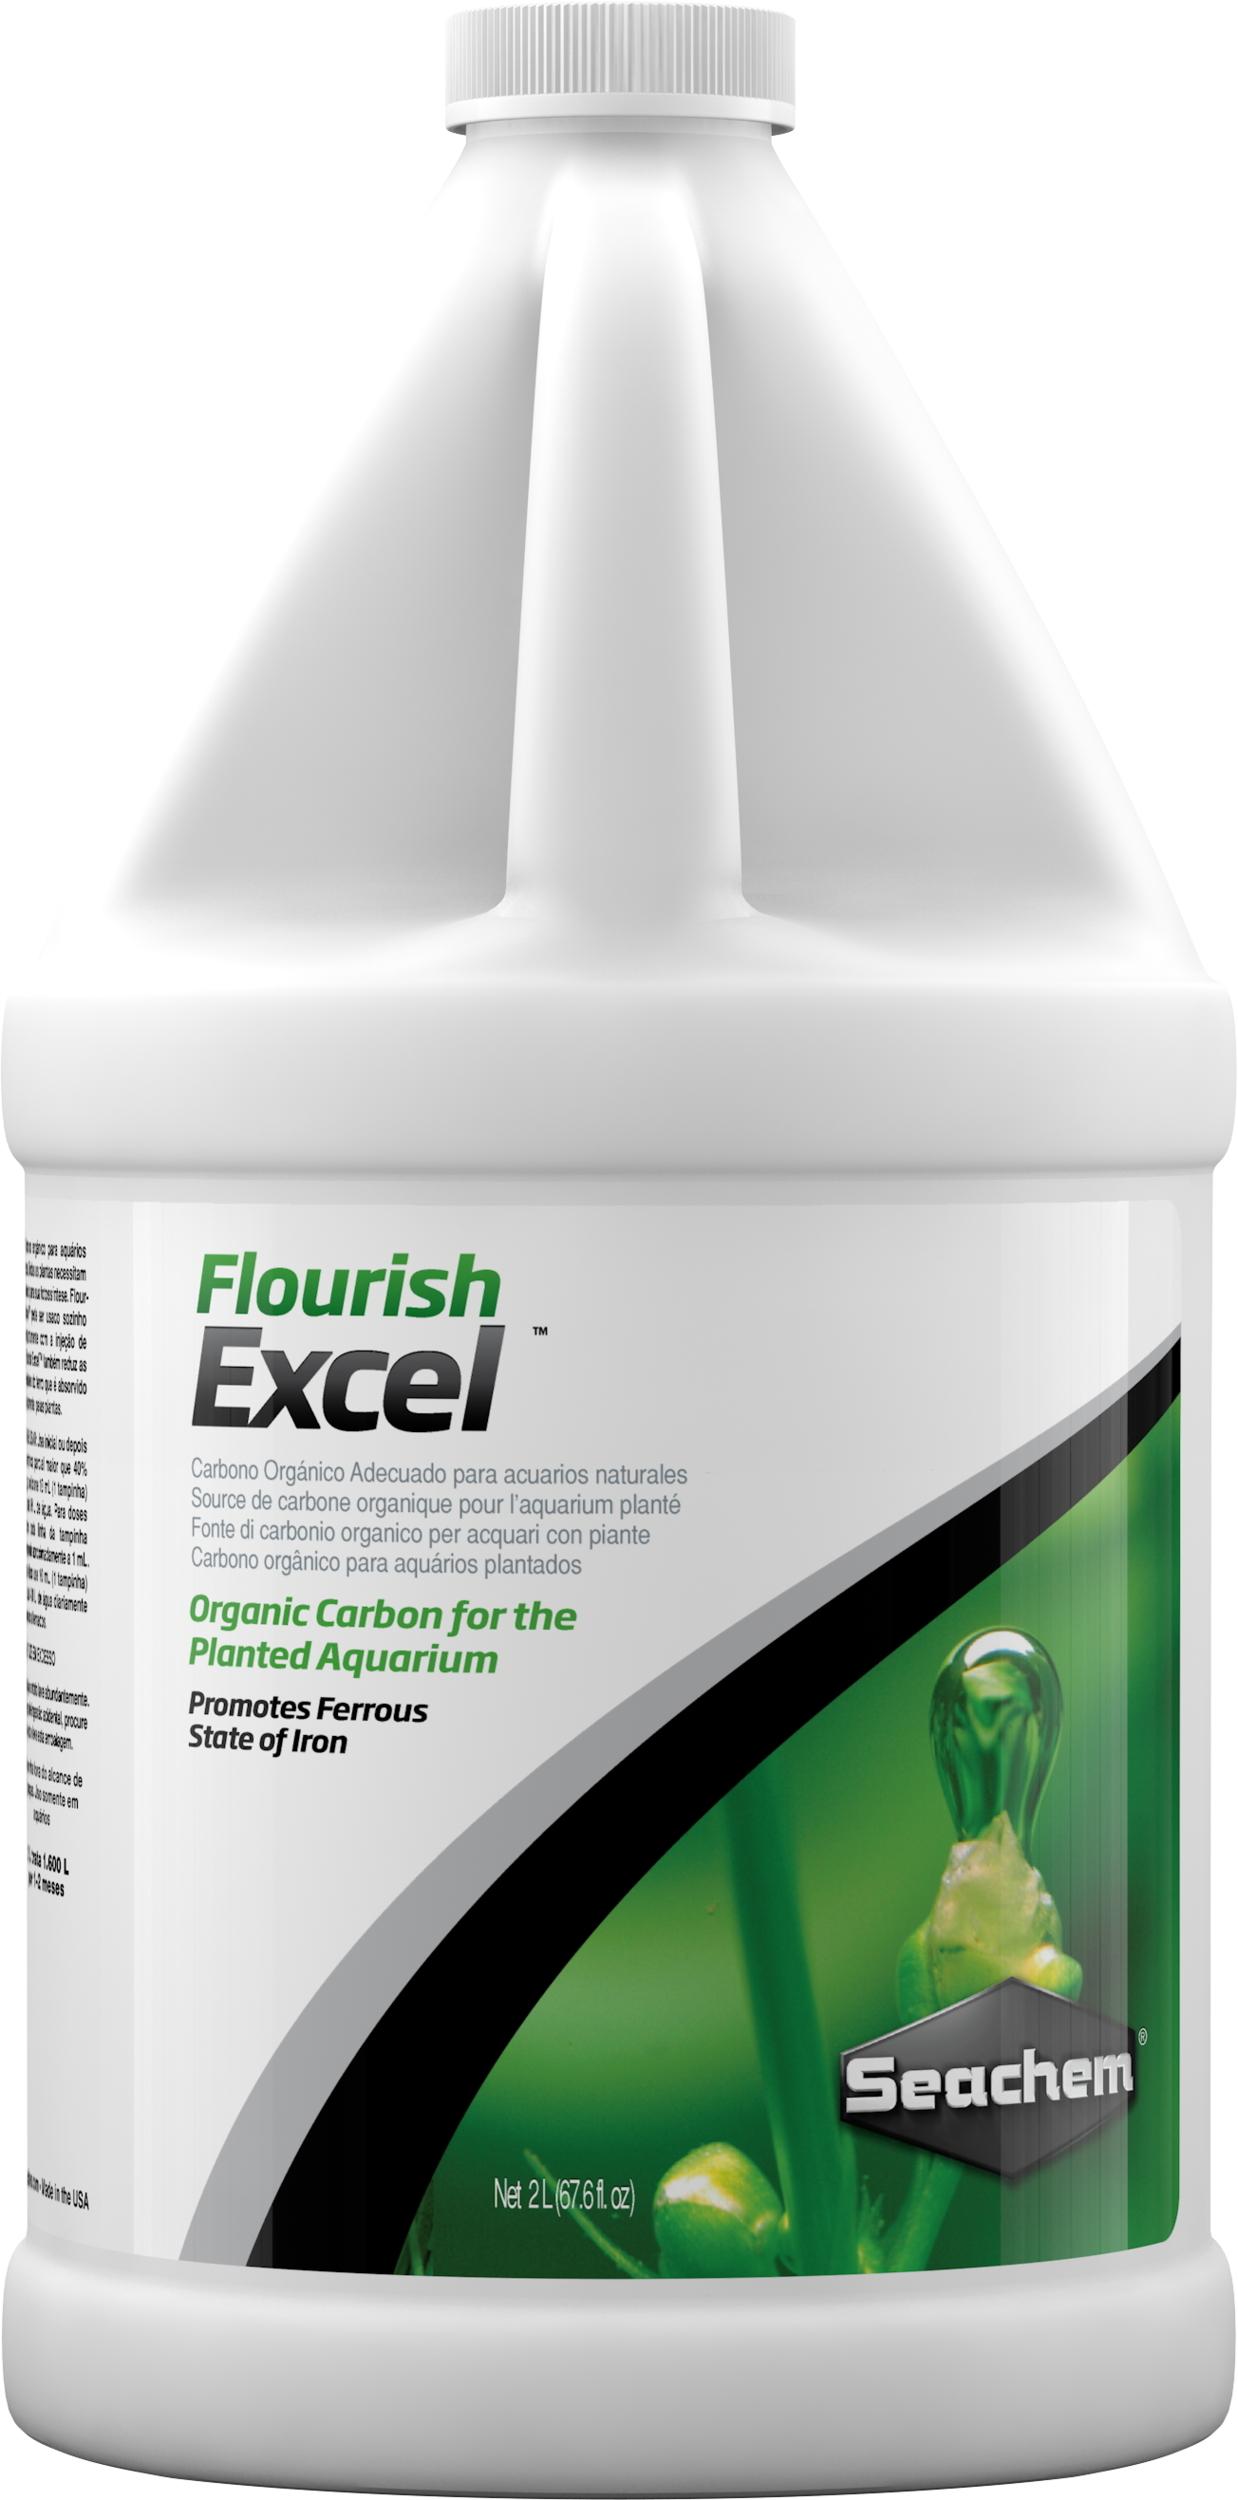 FlourishExcel-2L